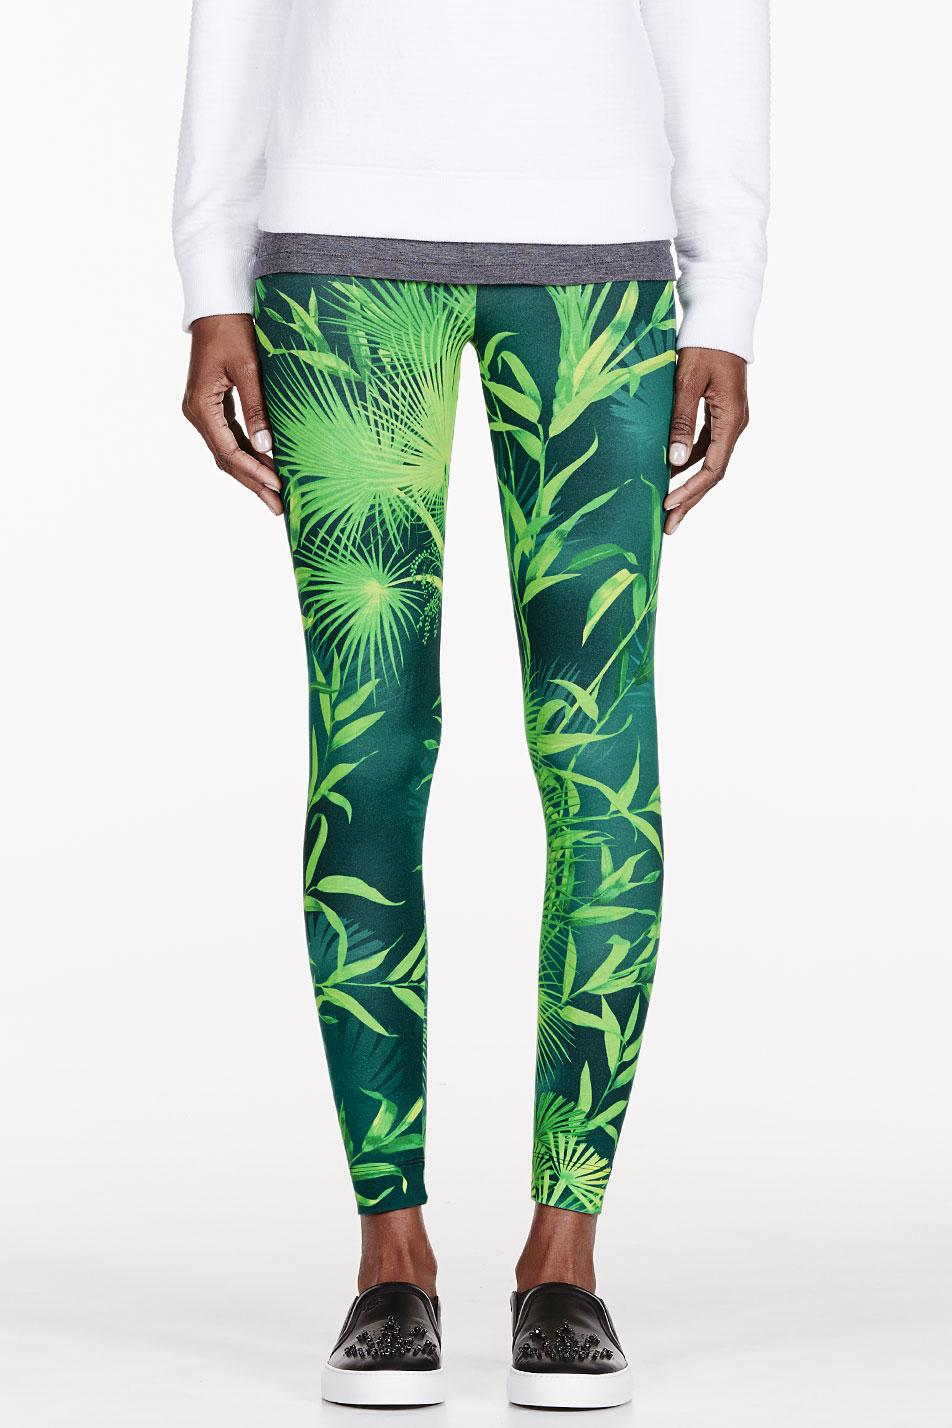 Versus green leaf print leggings